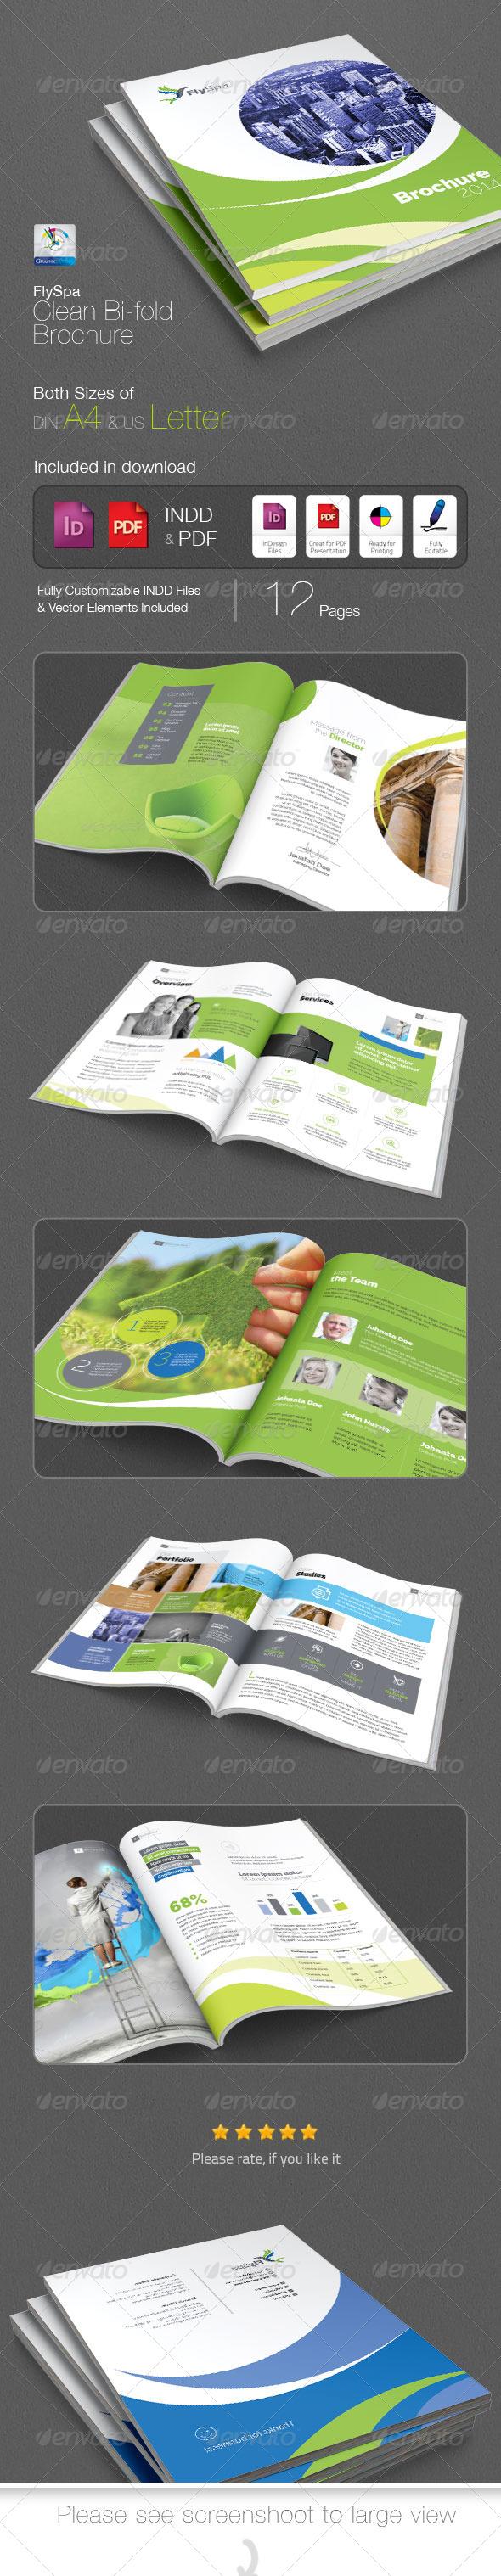 GraphicRiver FlySpa Bi-fold Brochure 5422114